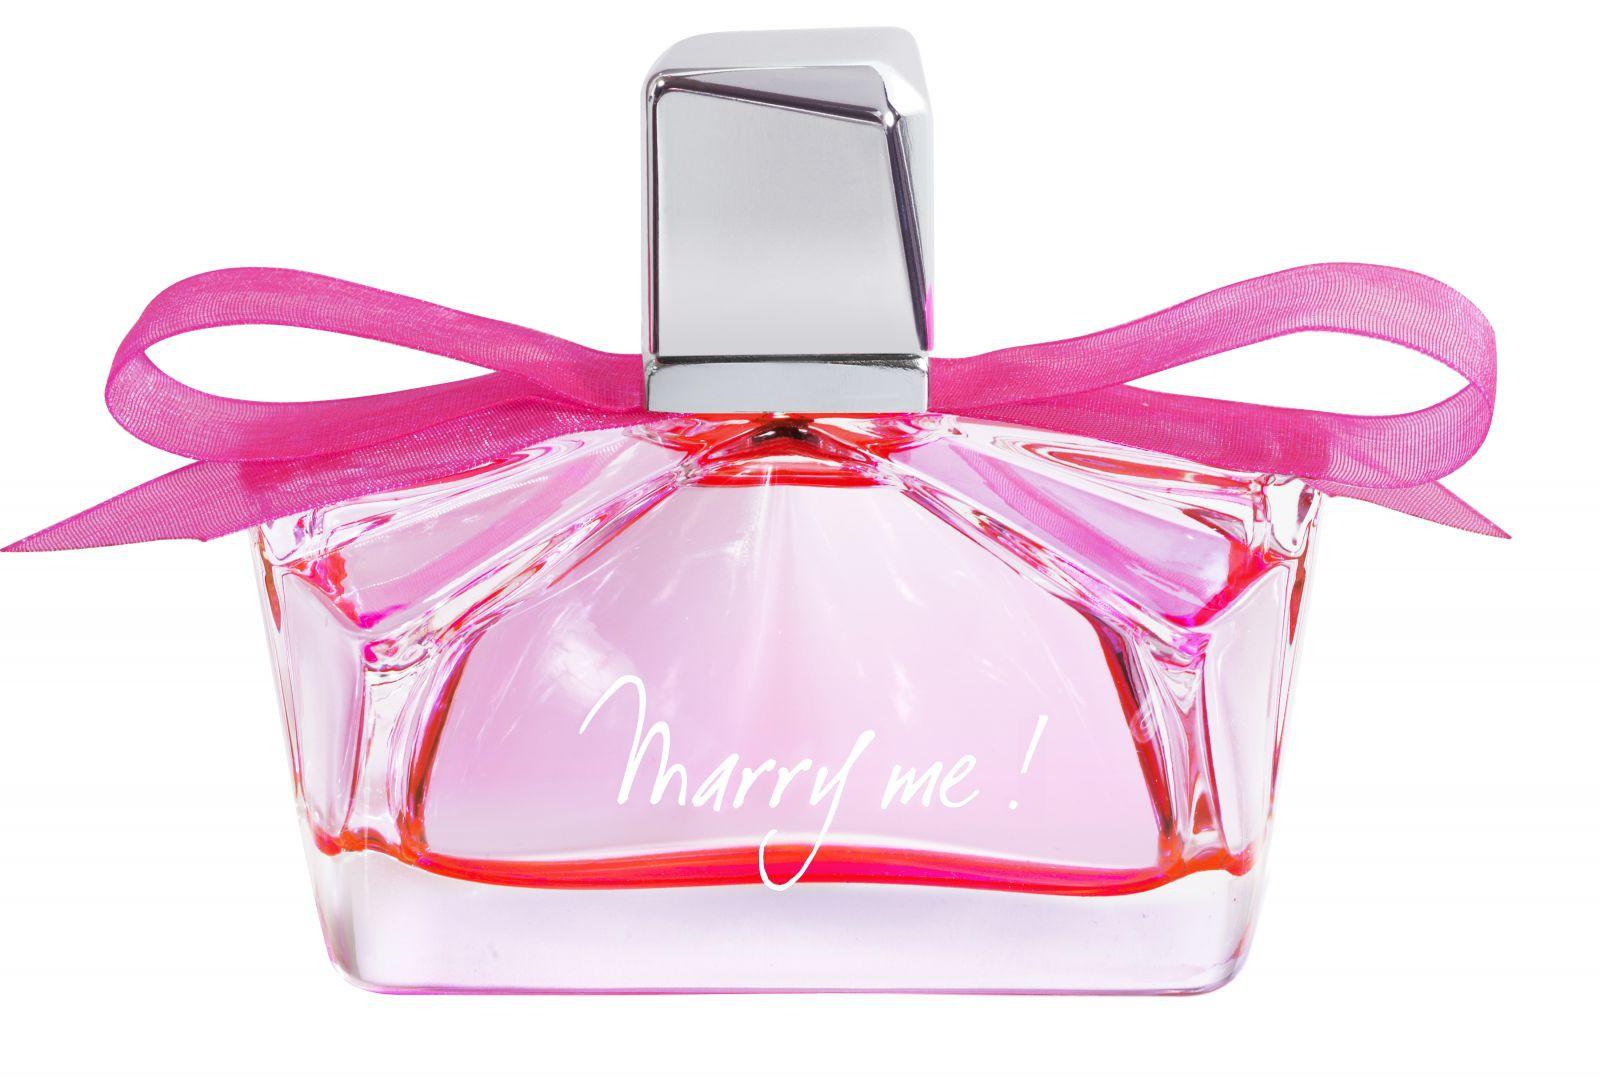 Lanvin Marry Me! à La Folie аромат для женщин